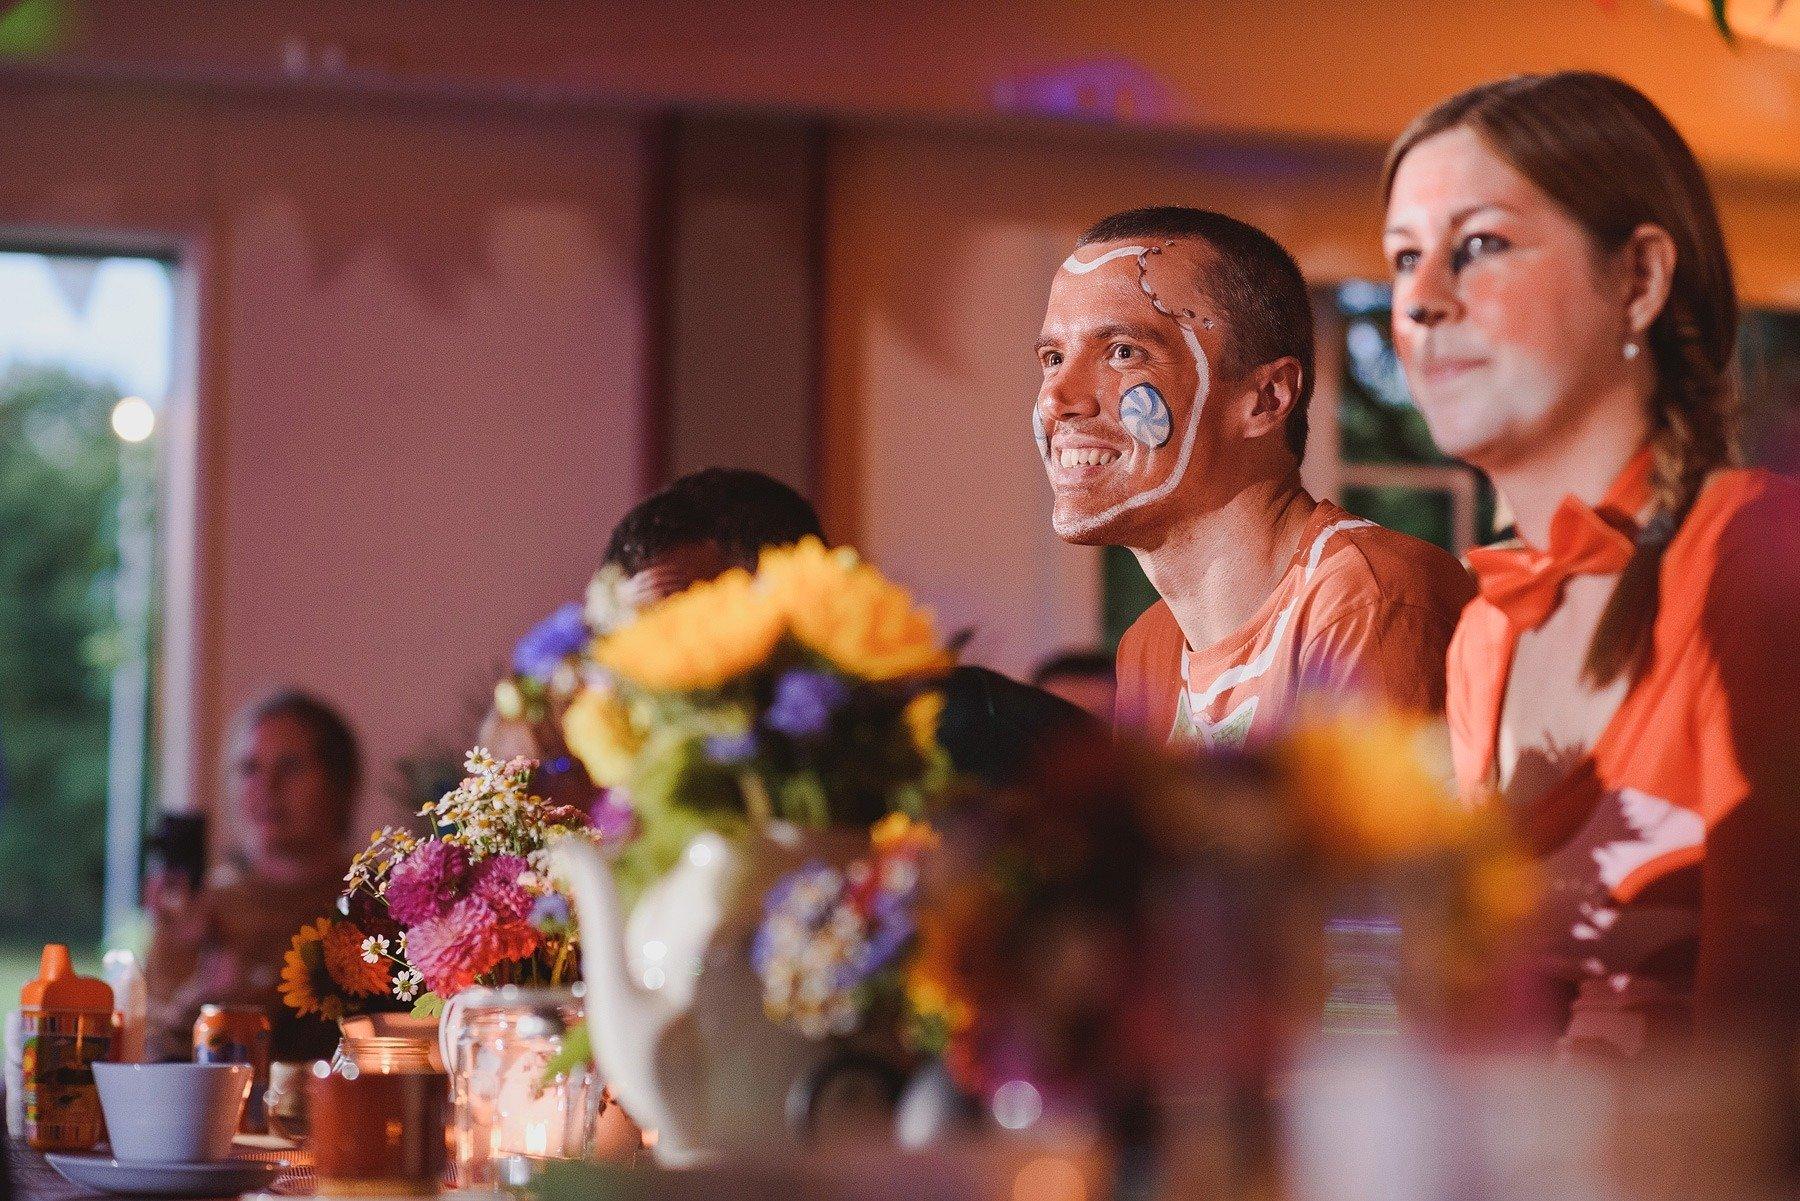 fancy dress wedding guests